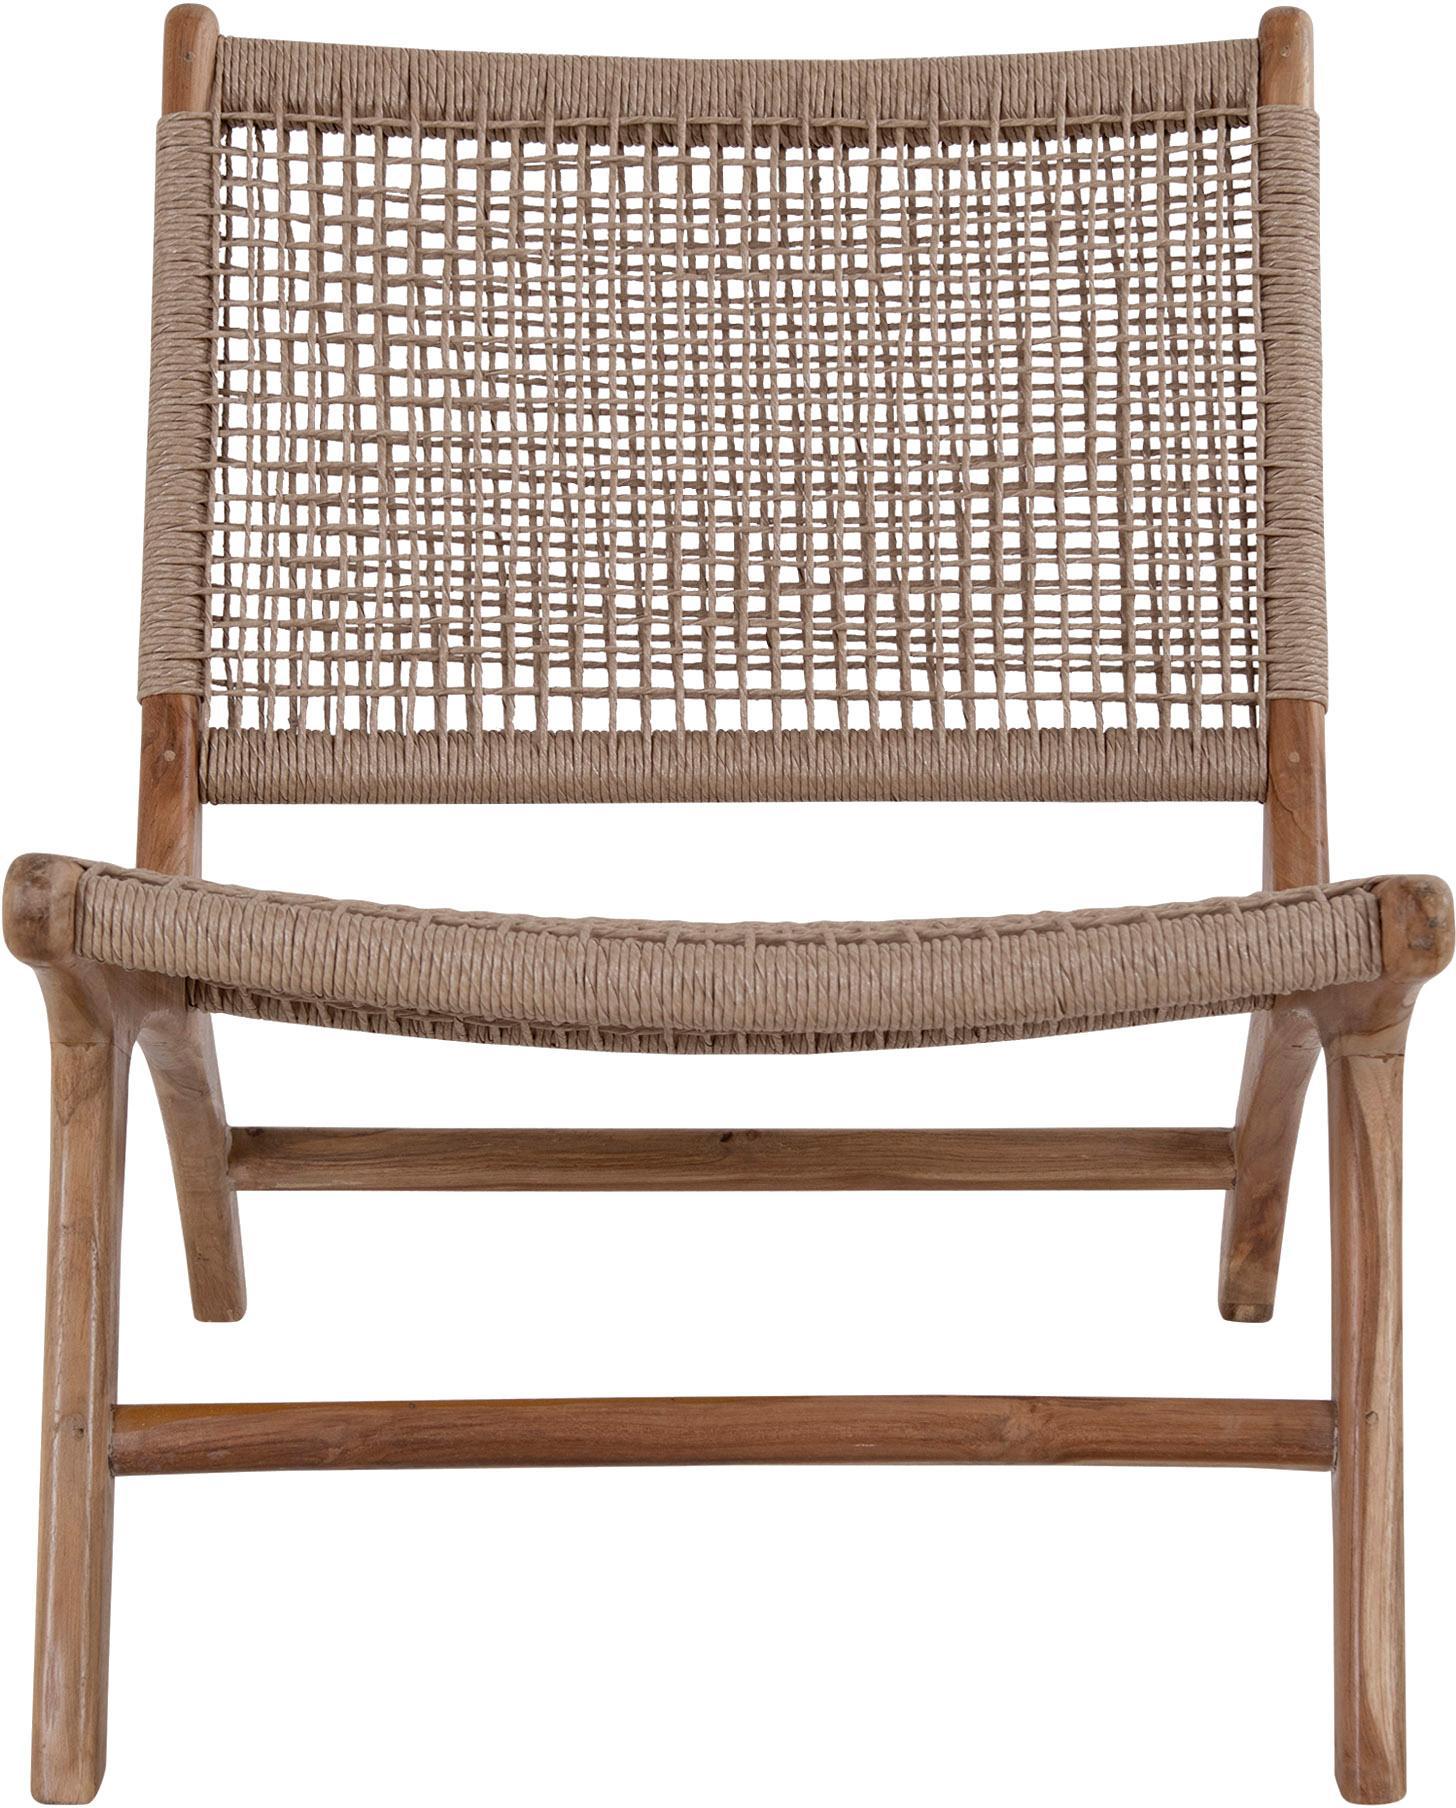 Loungesessel Derby aus Teakholz und Polyrattan, Gestell: Teakholz, Teakholz, Beige, B 60 x T 80 cm